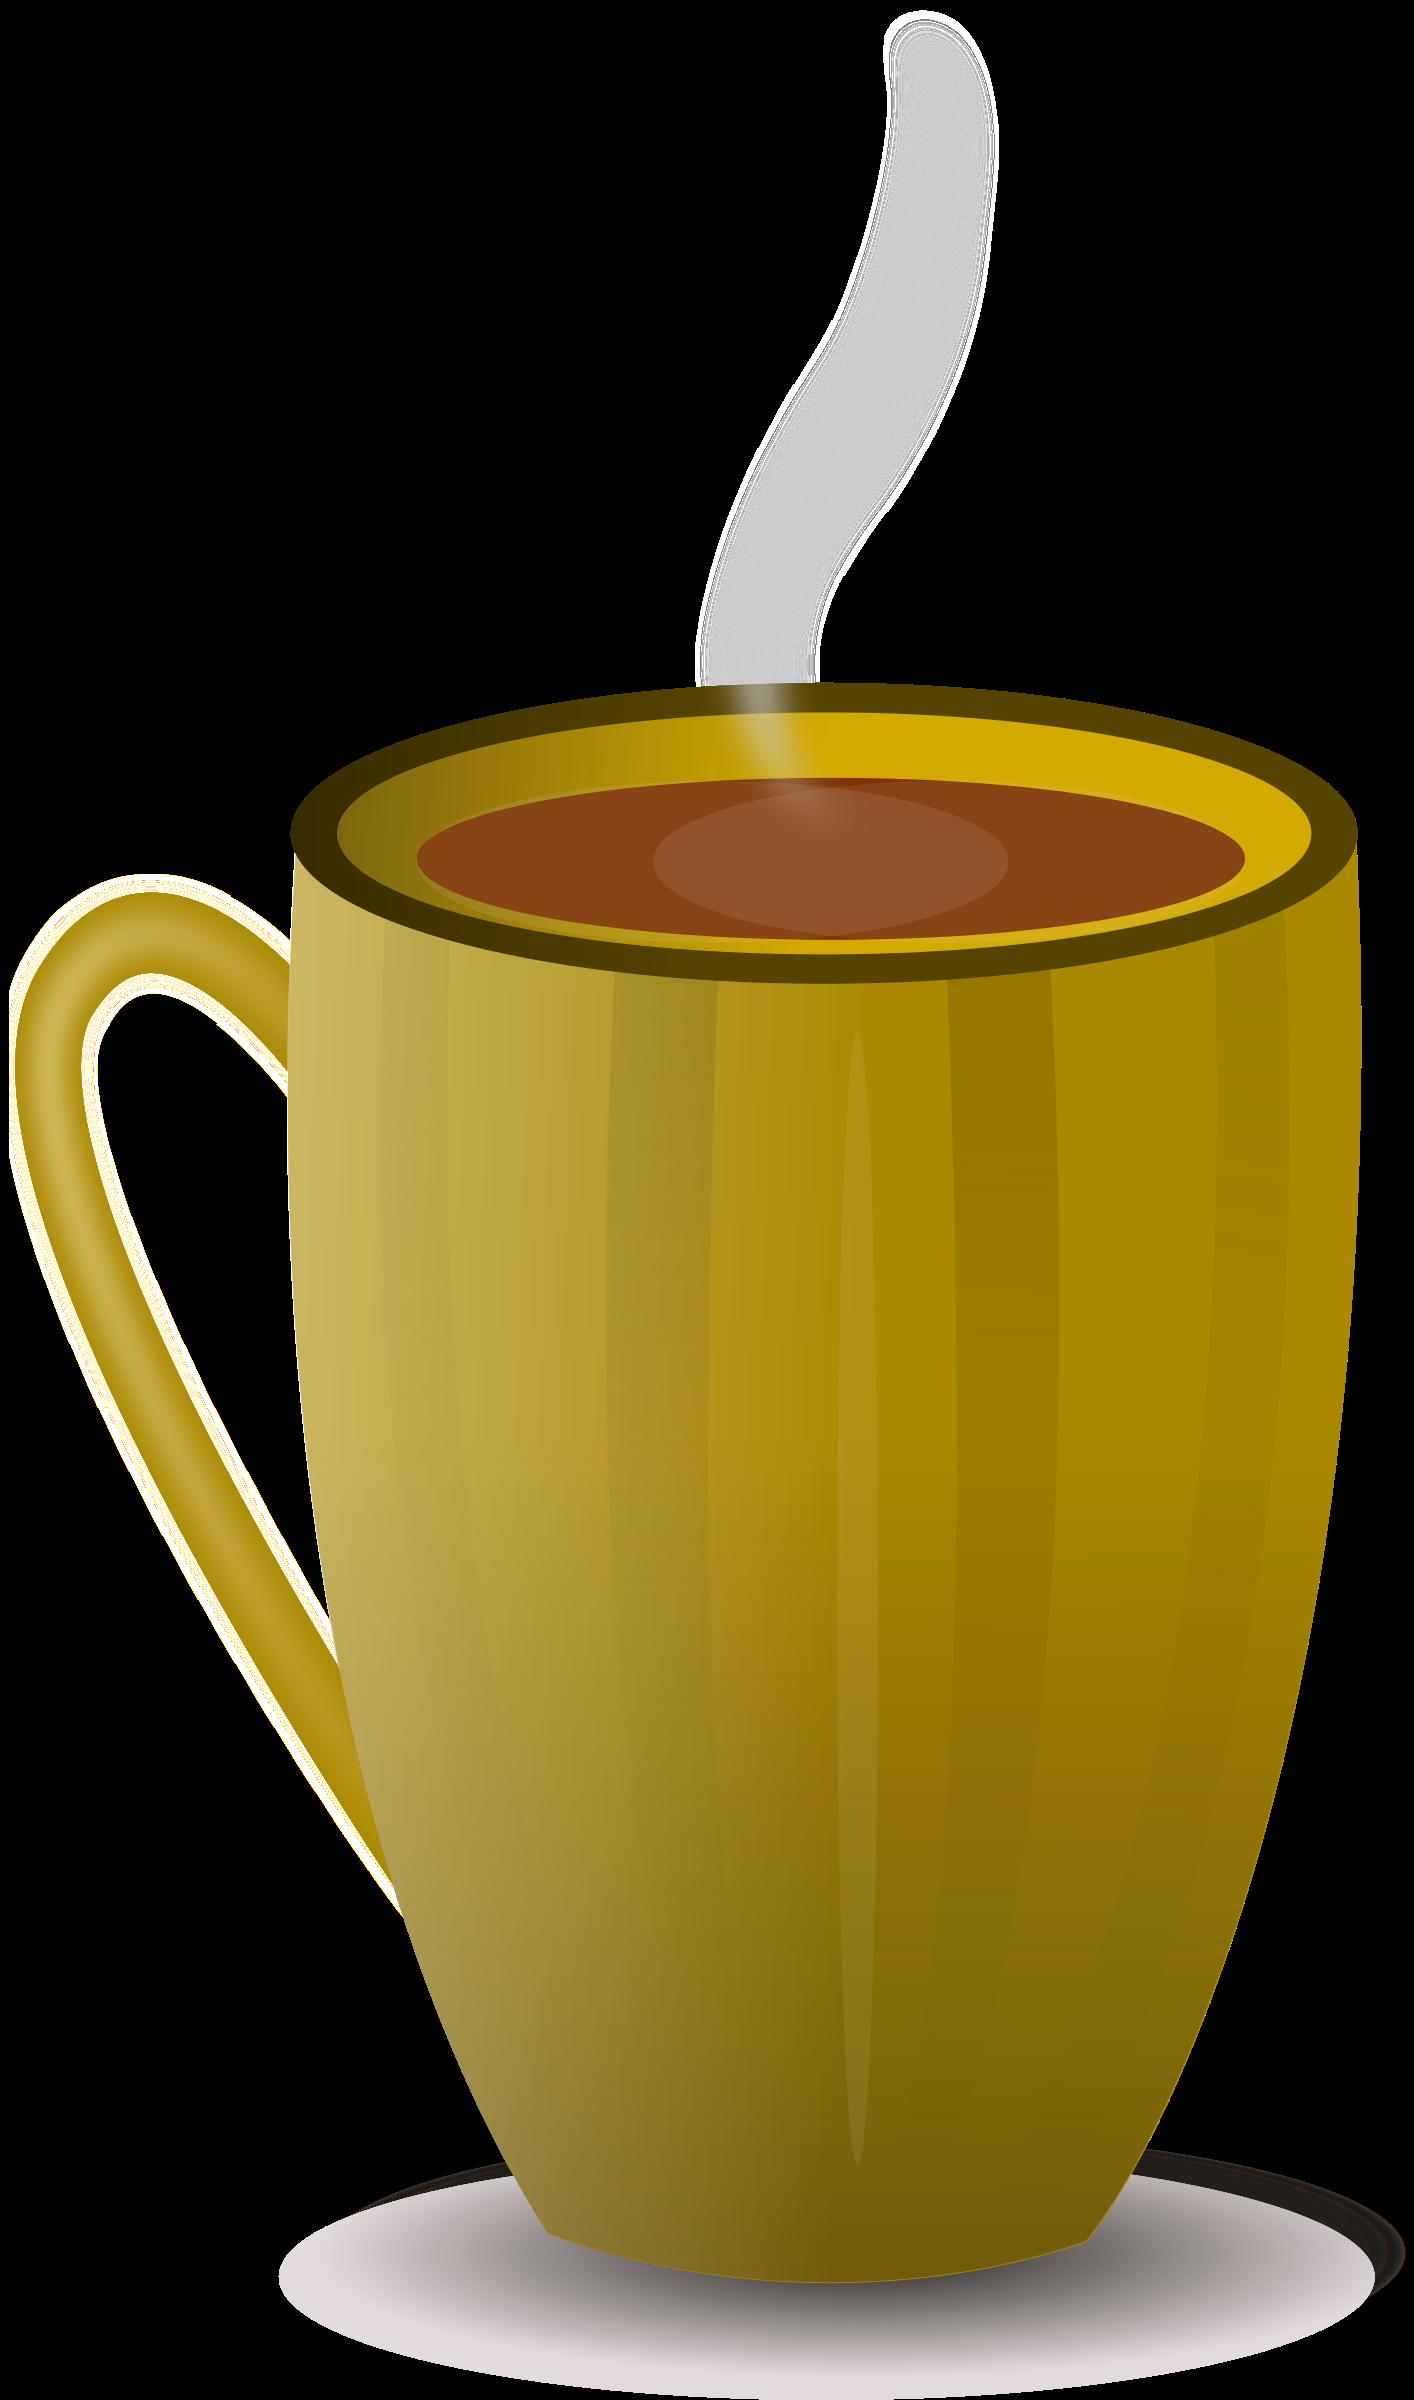 Coffee cup big image. Tea clipart bashi